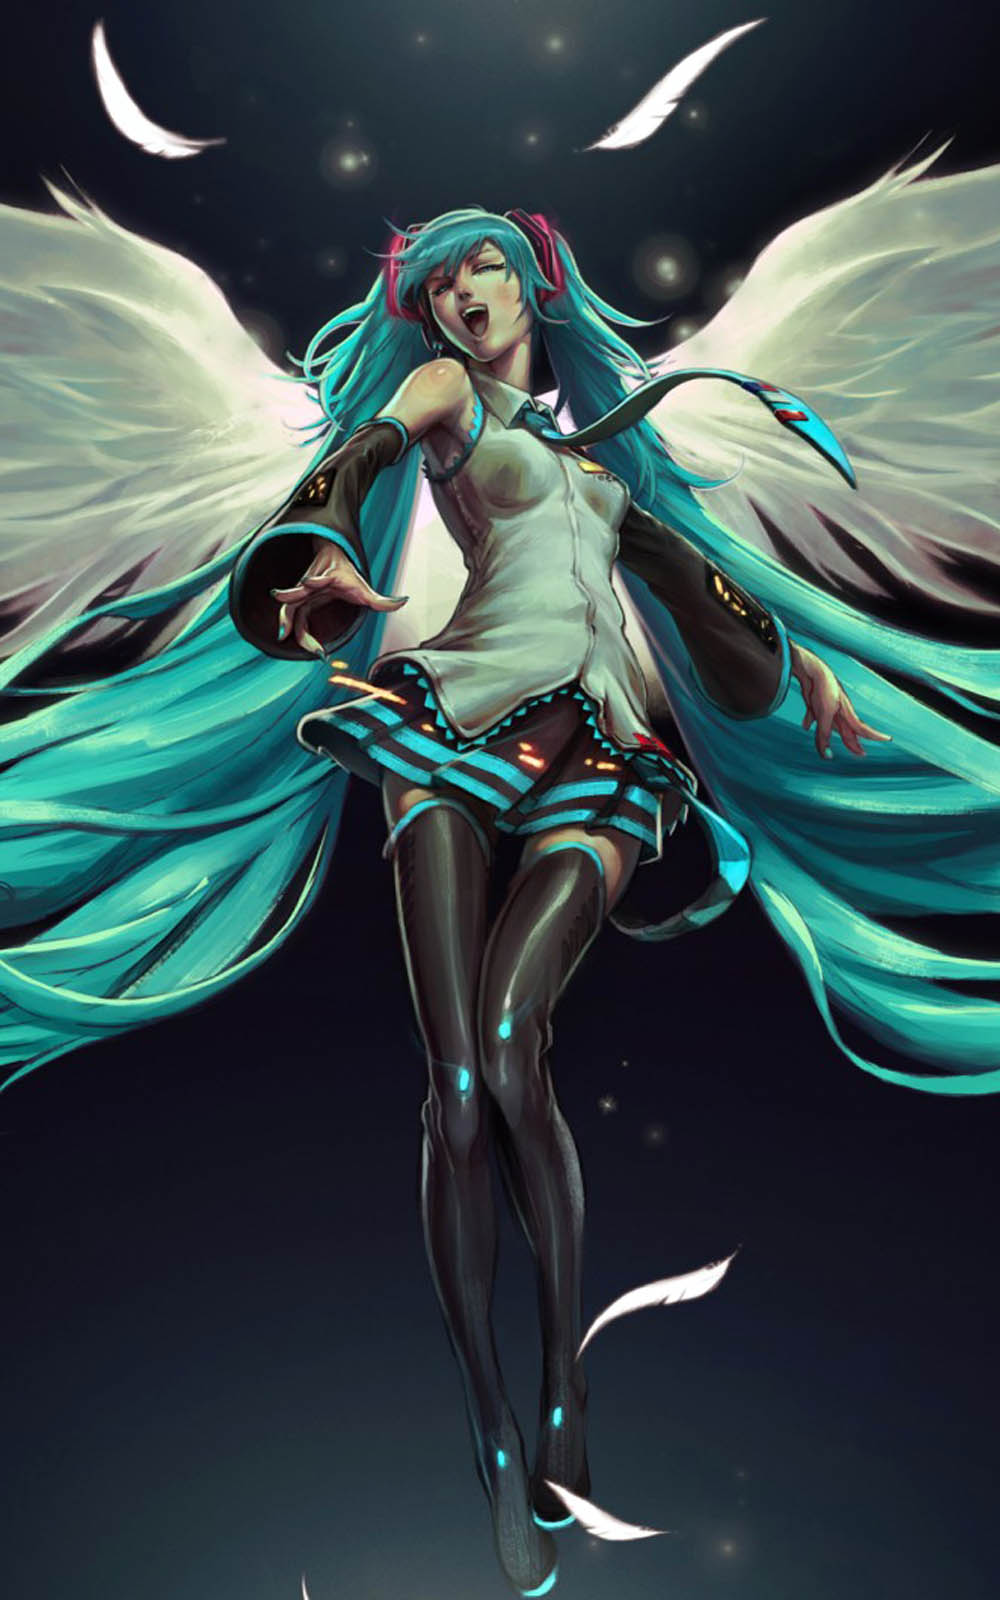 Hatsune Miku Angel 4K Ultra HD Mobile Wallpaper